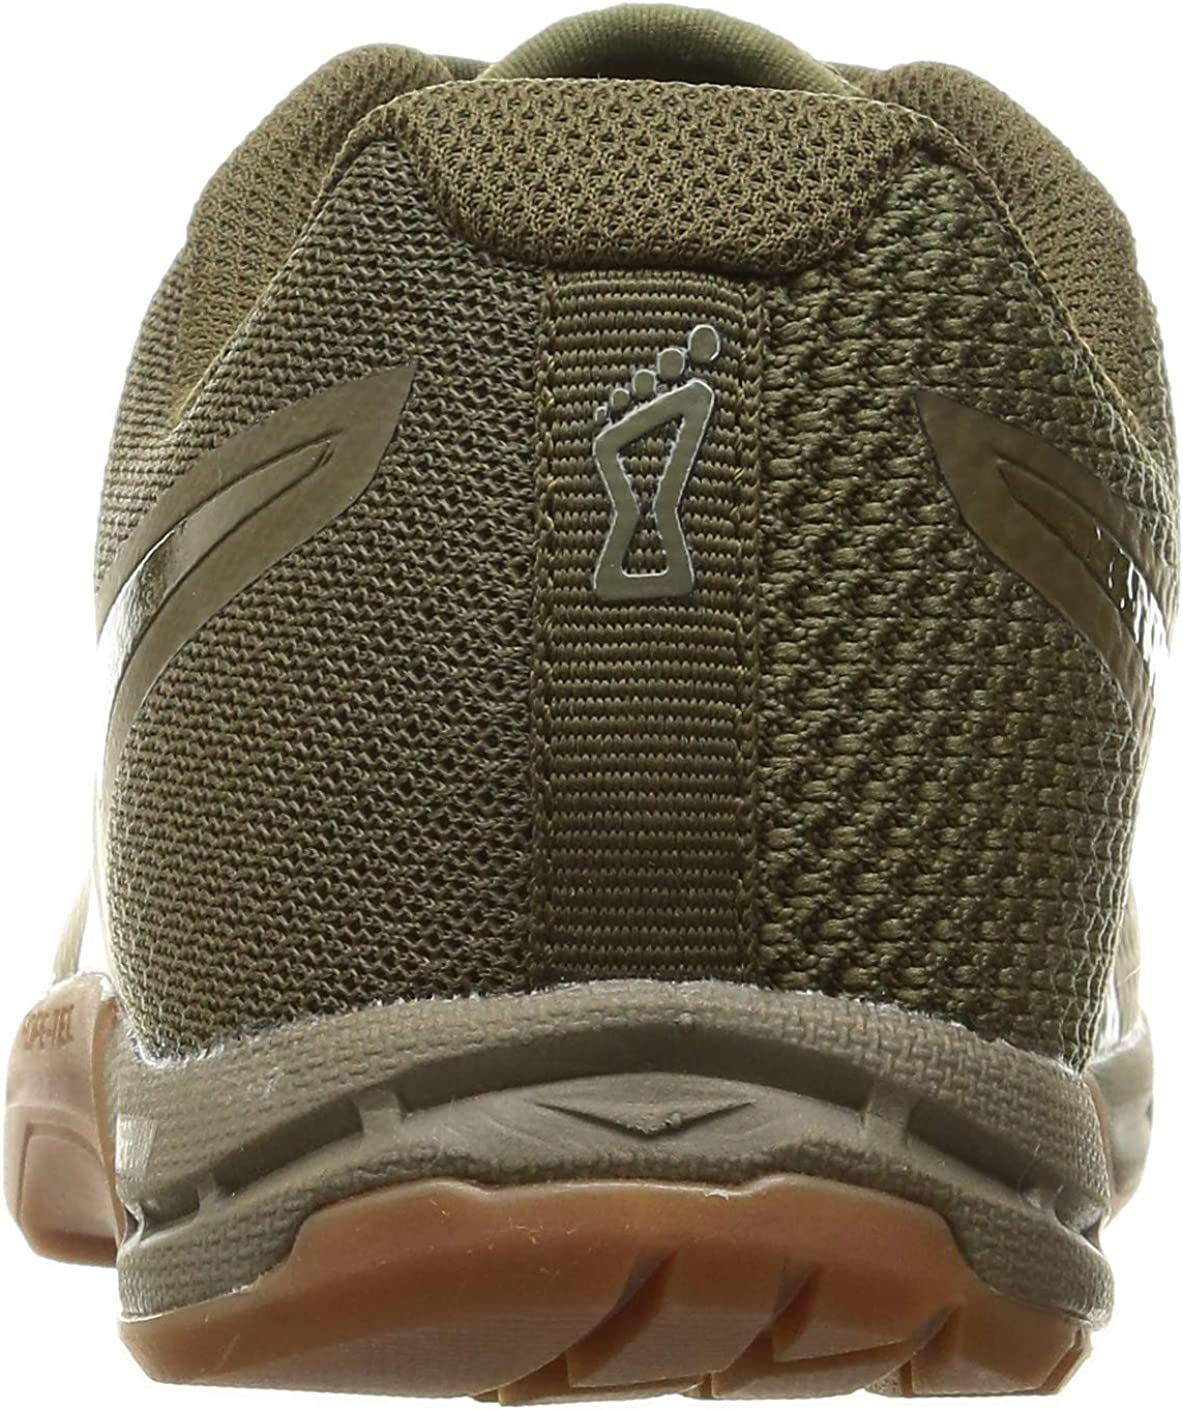 Inov-8 Mens F-Lite 235 V3 - Ultimate Supernatural Cross Training Shoes - Flexible and Lightweight Khaki/Gum